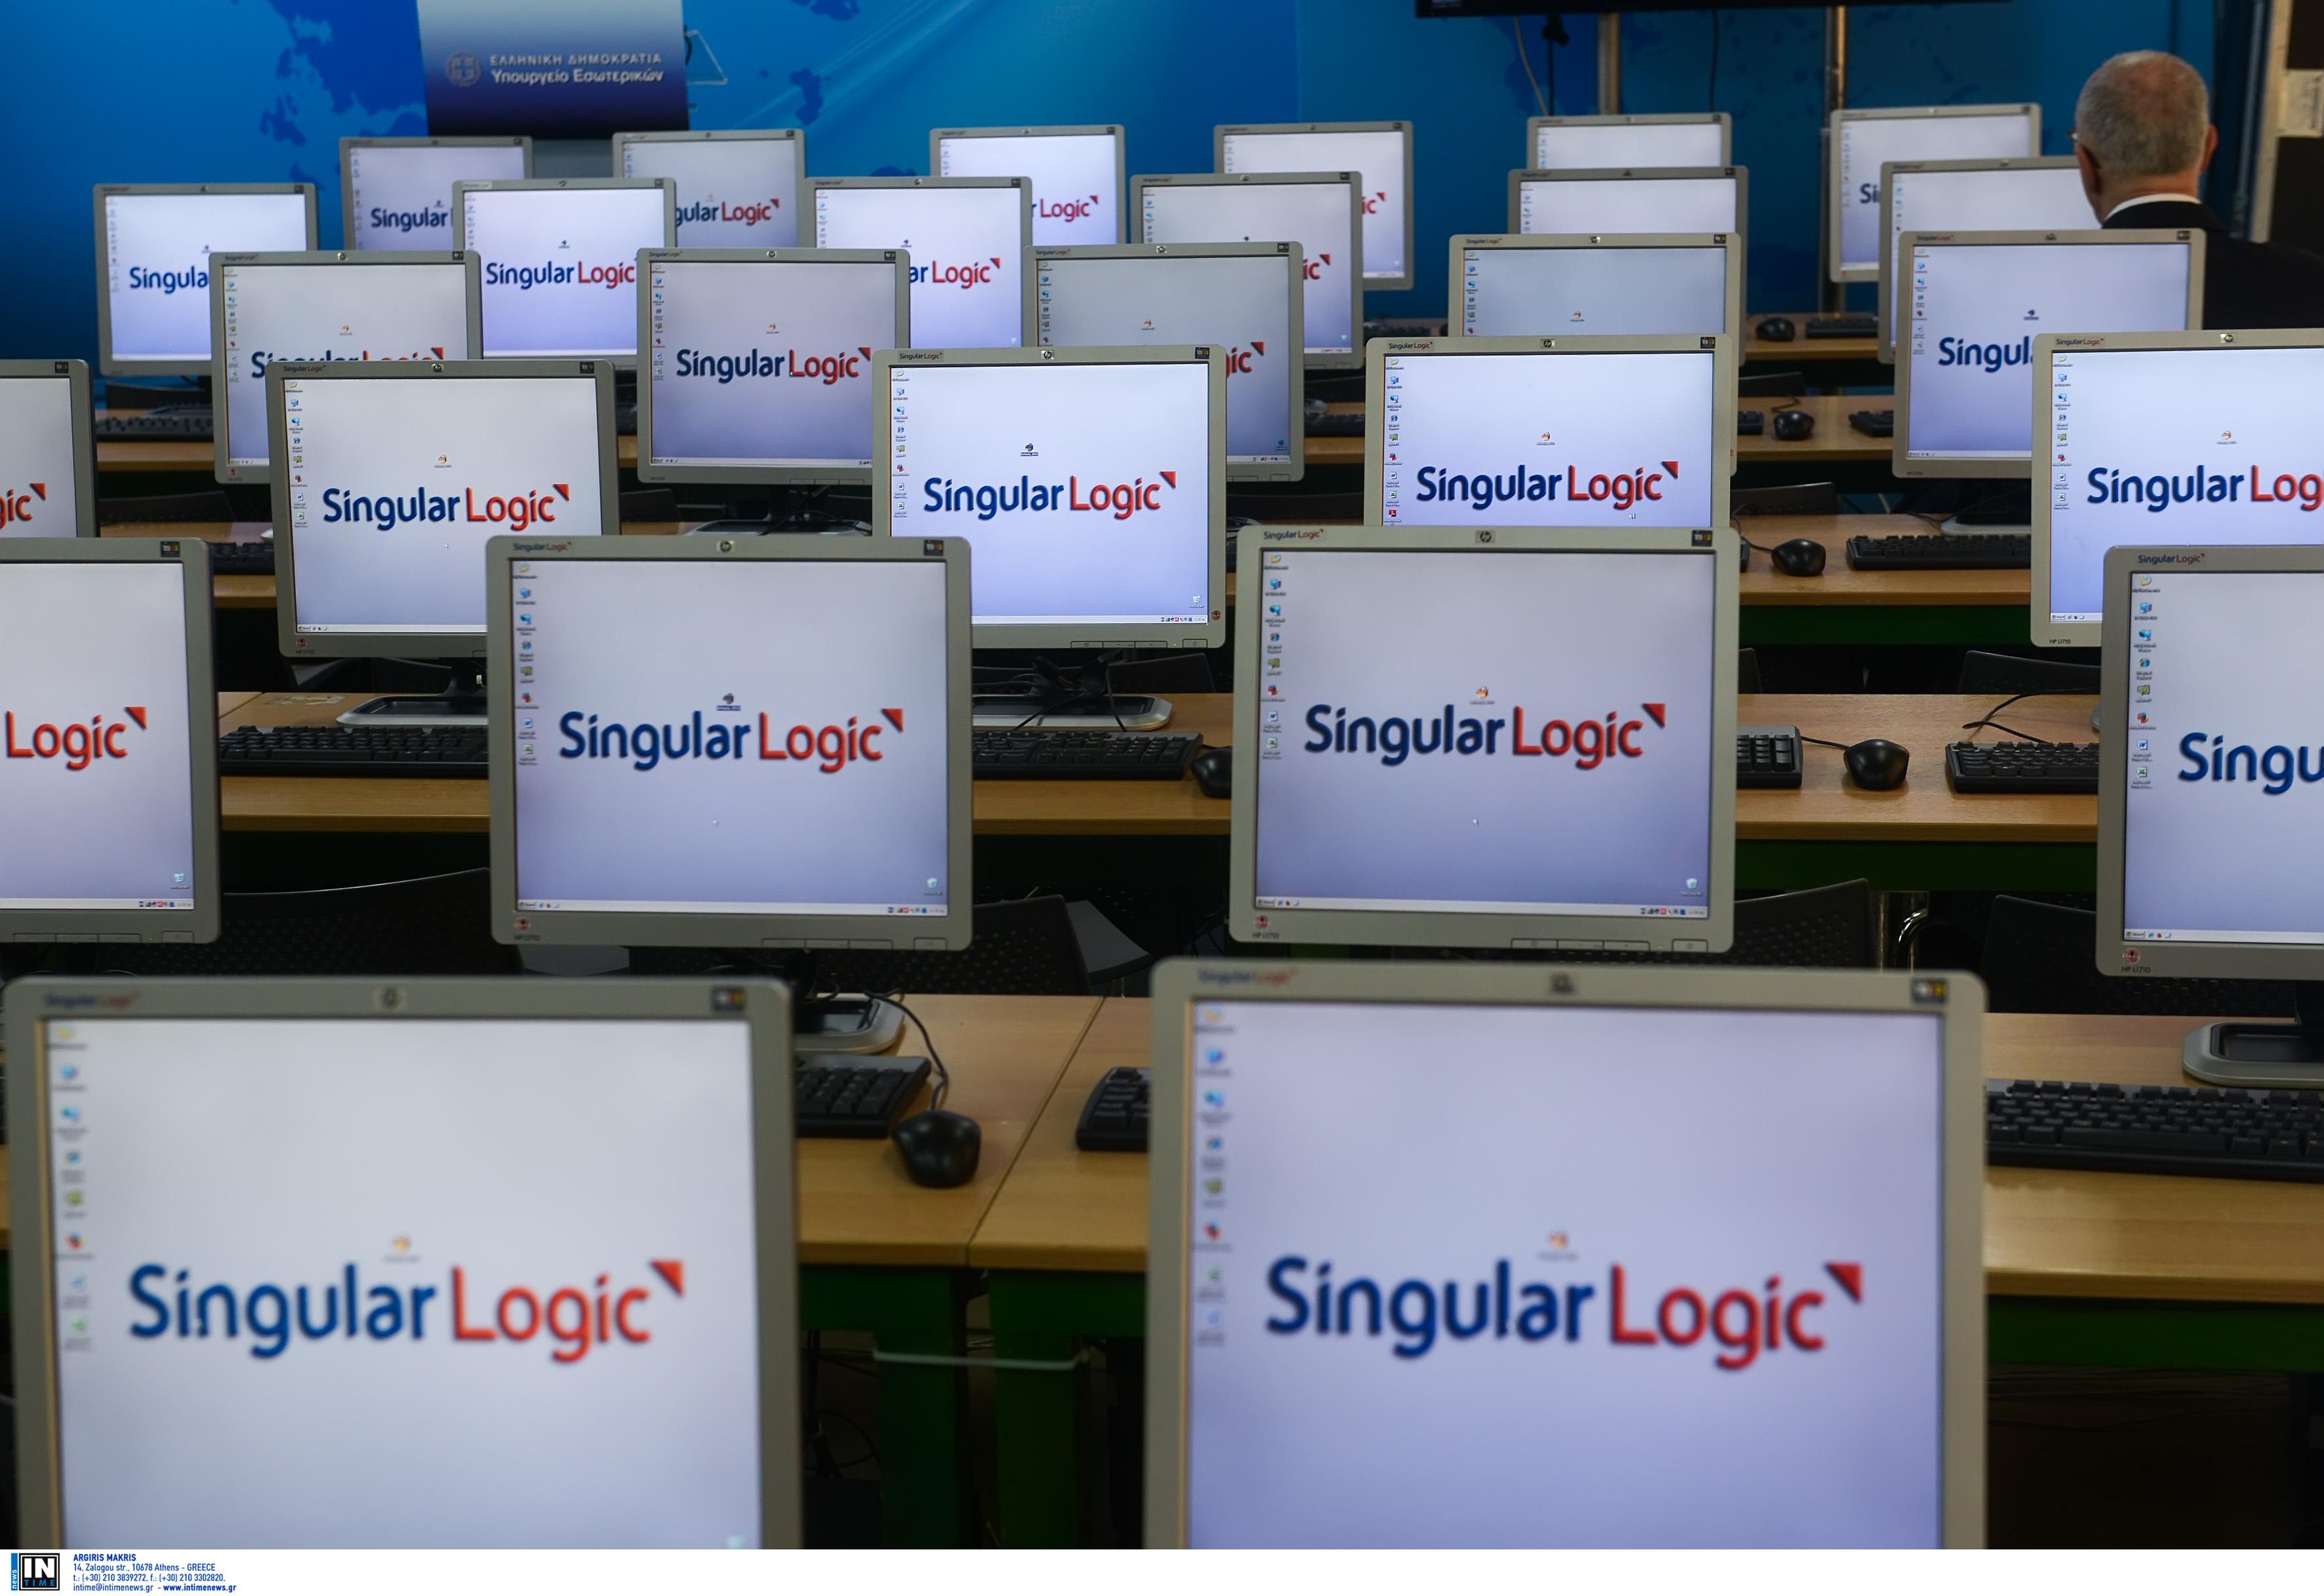 SingularLogic: Νέος γενικός διευθυντής Integration ο Δημήτρης Μπακάκος